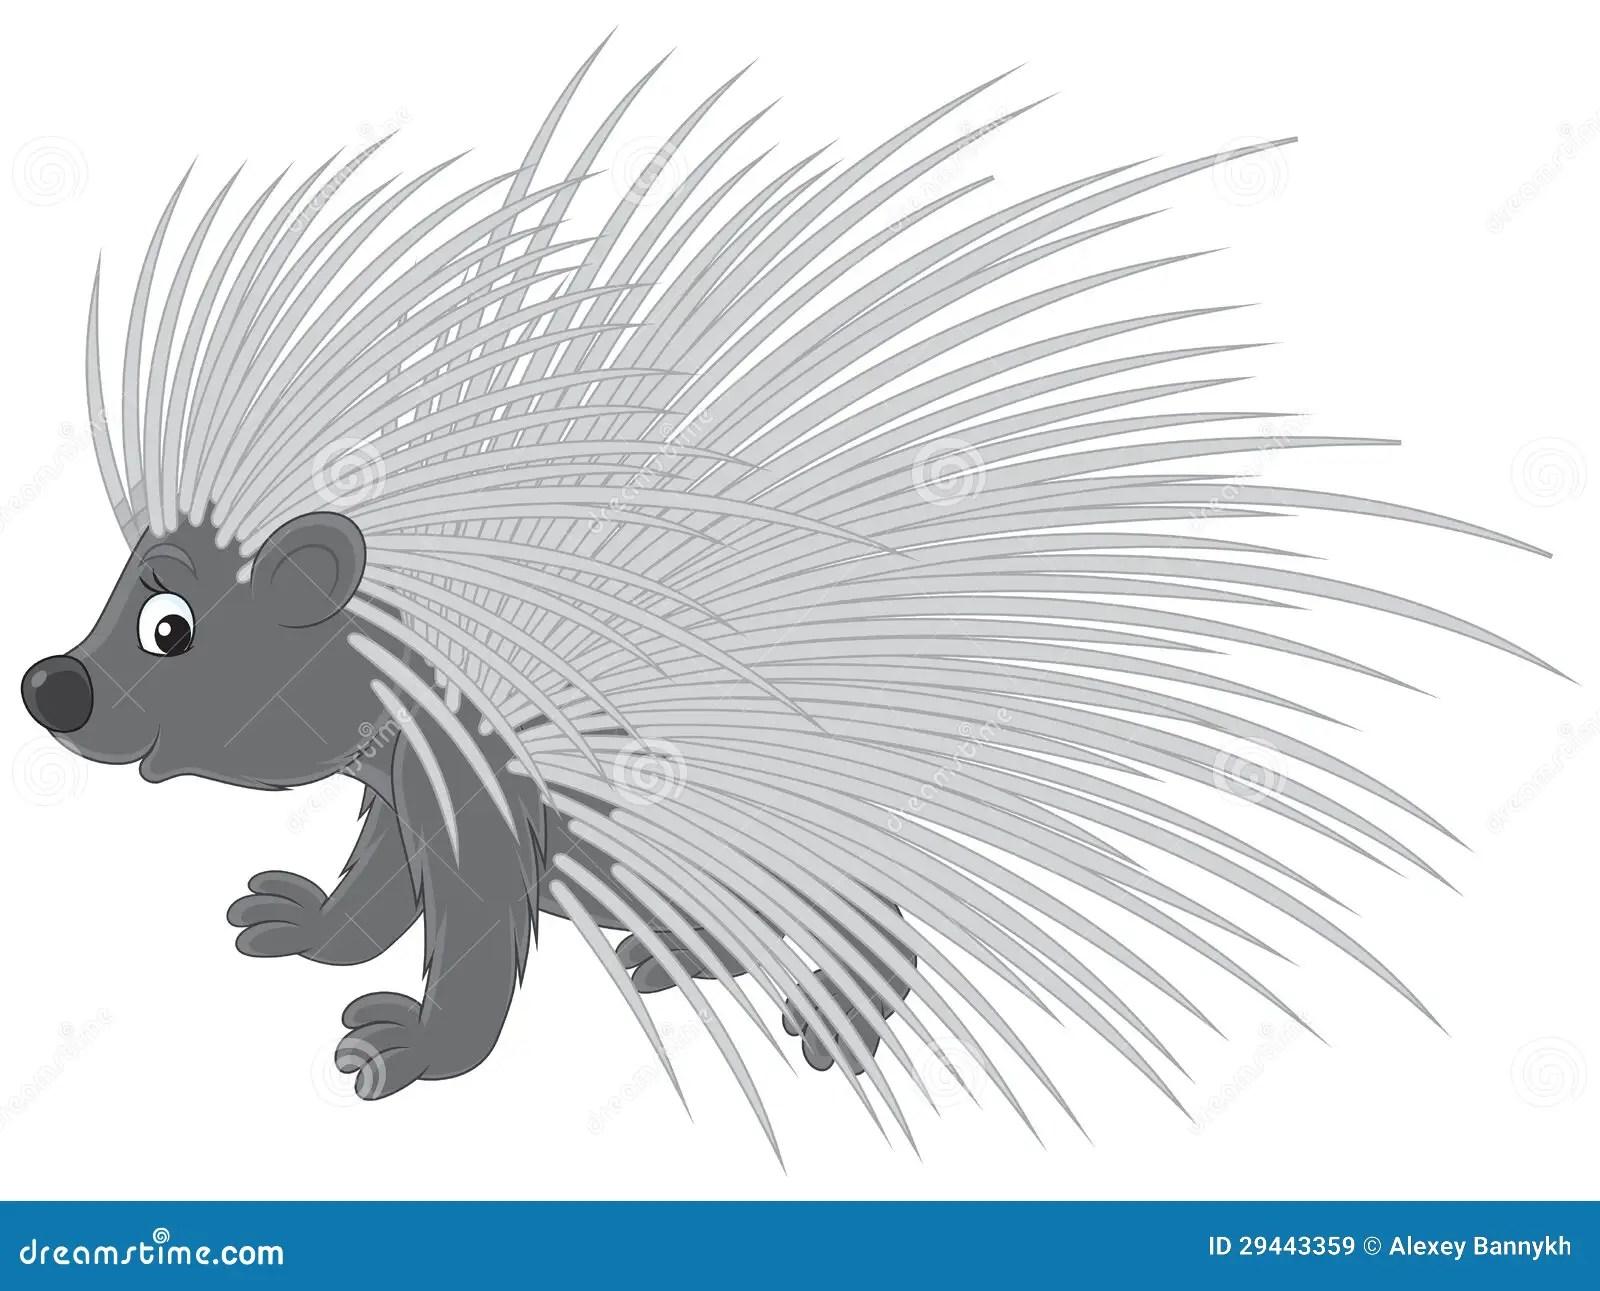 hight resolution of porcupine